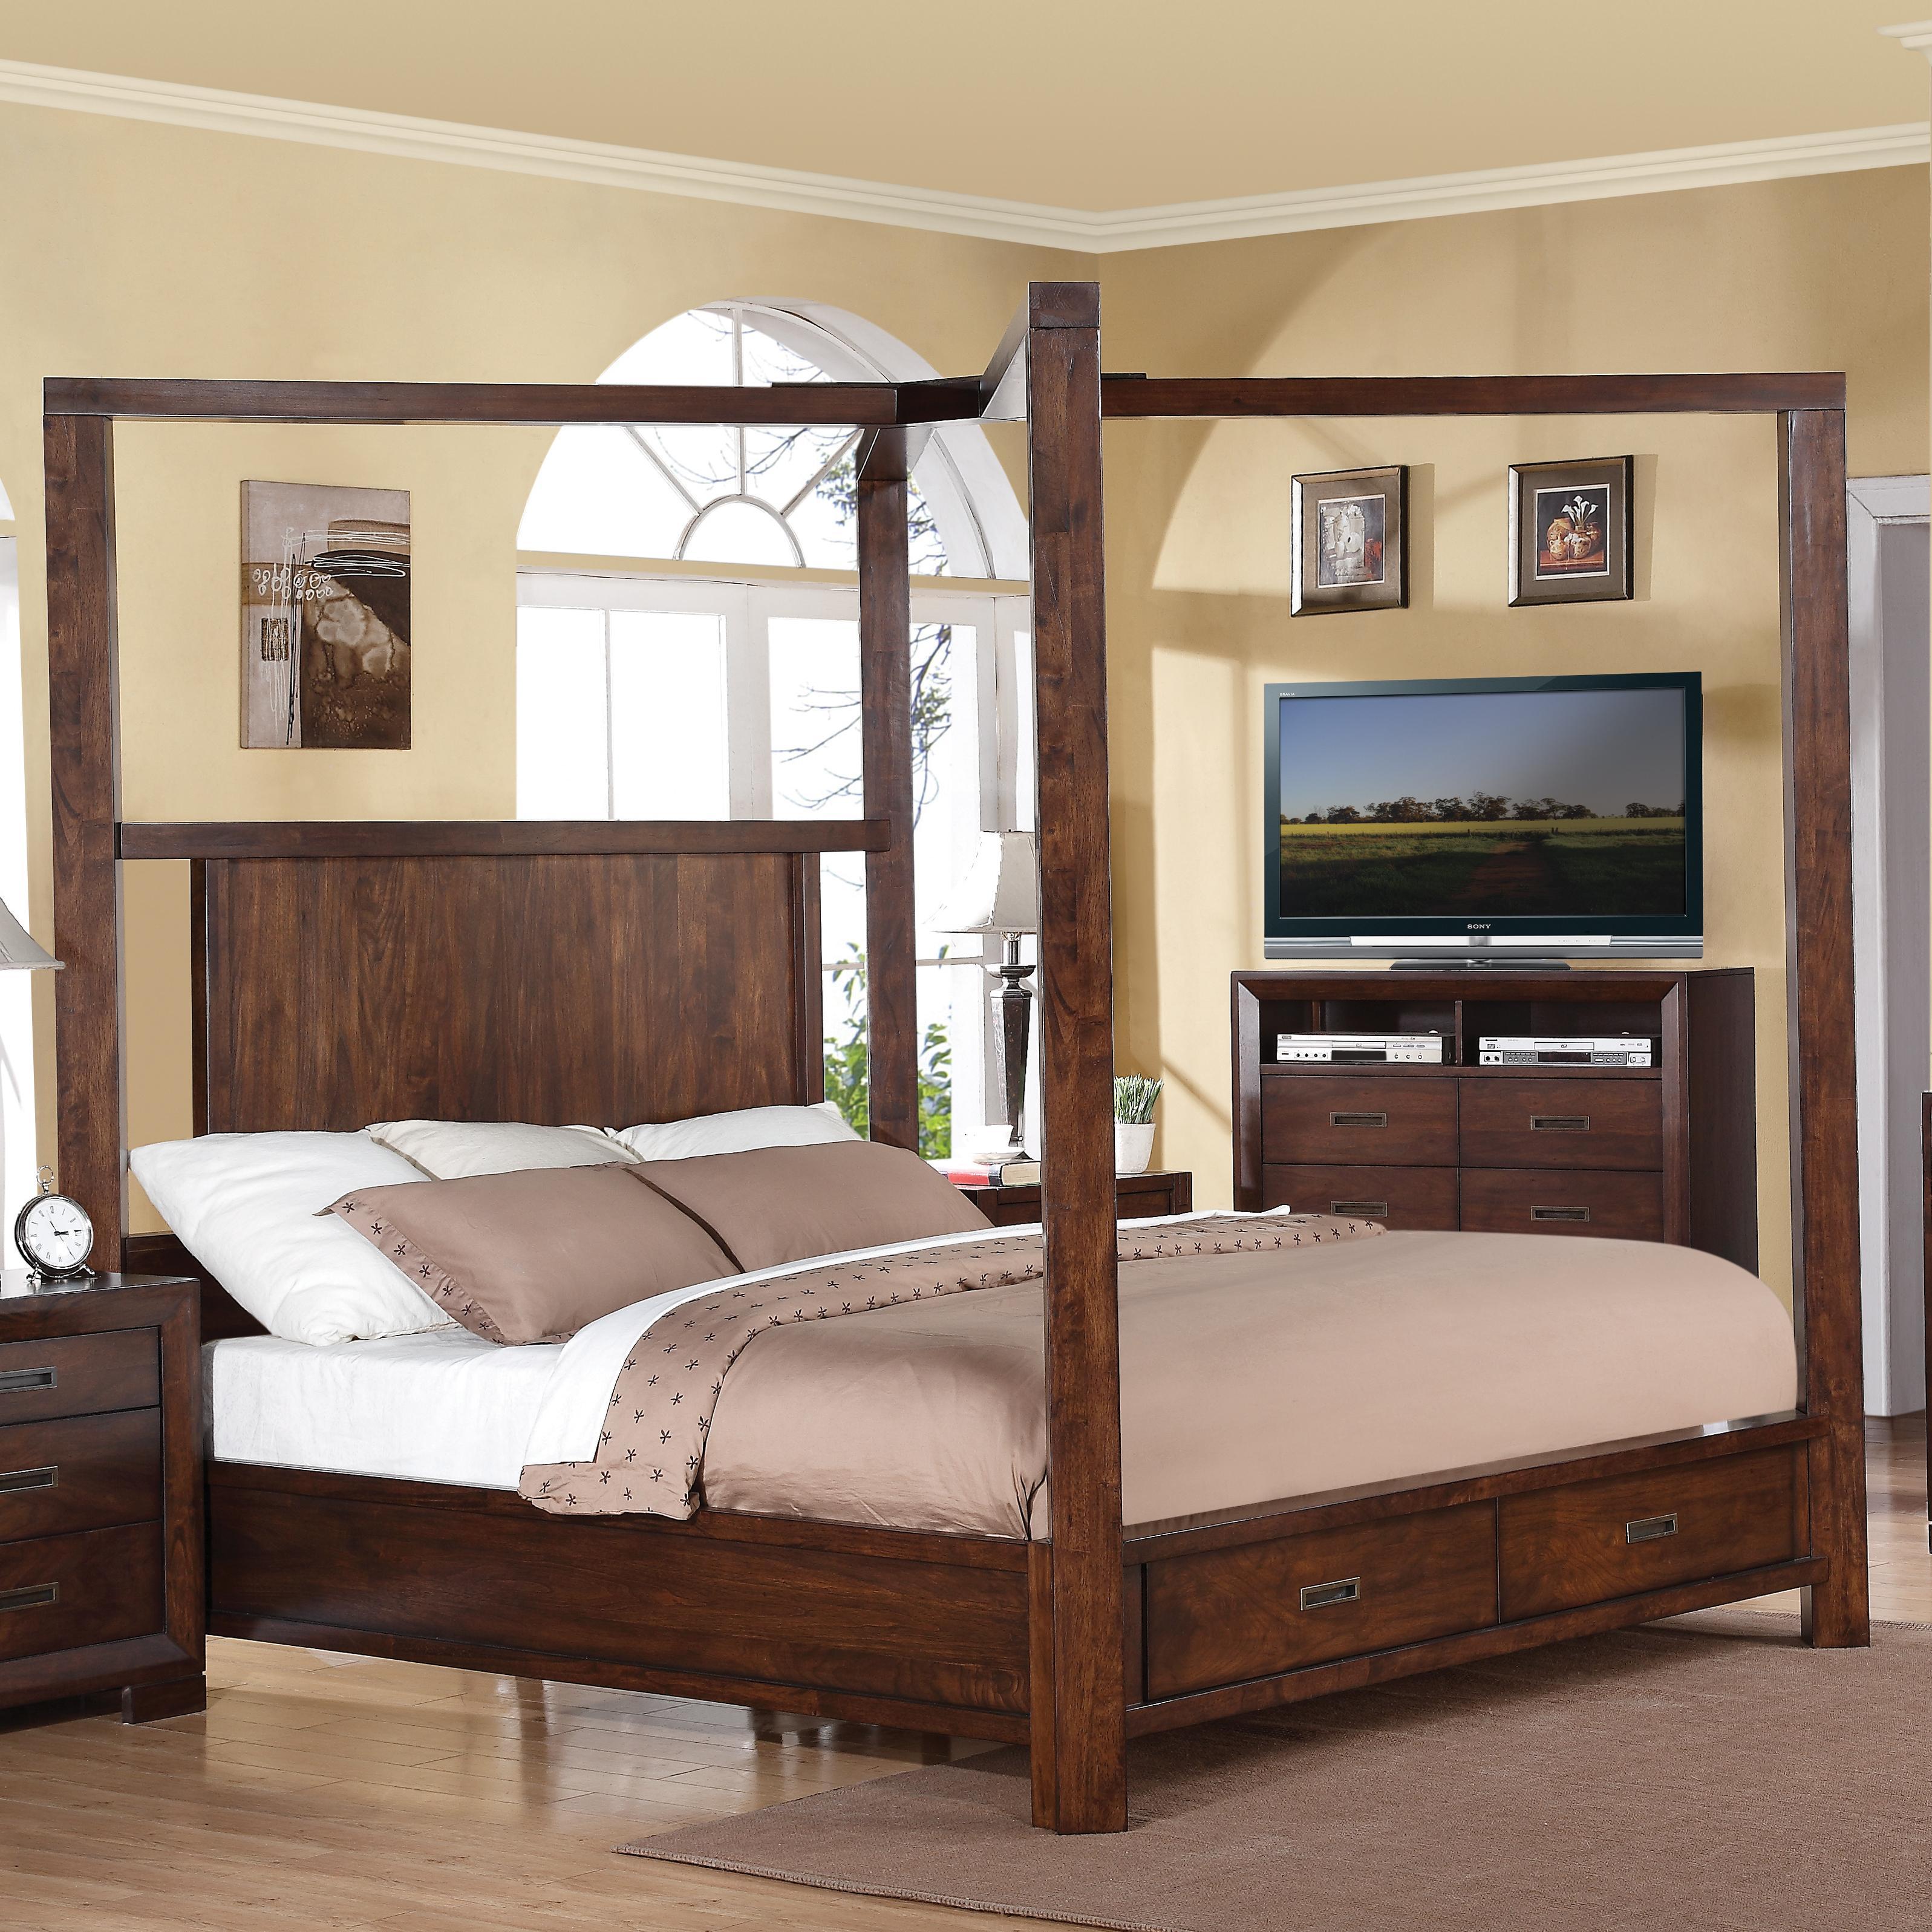 Riverside furniture riata queen canopy storage bed for Hudsons furniture